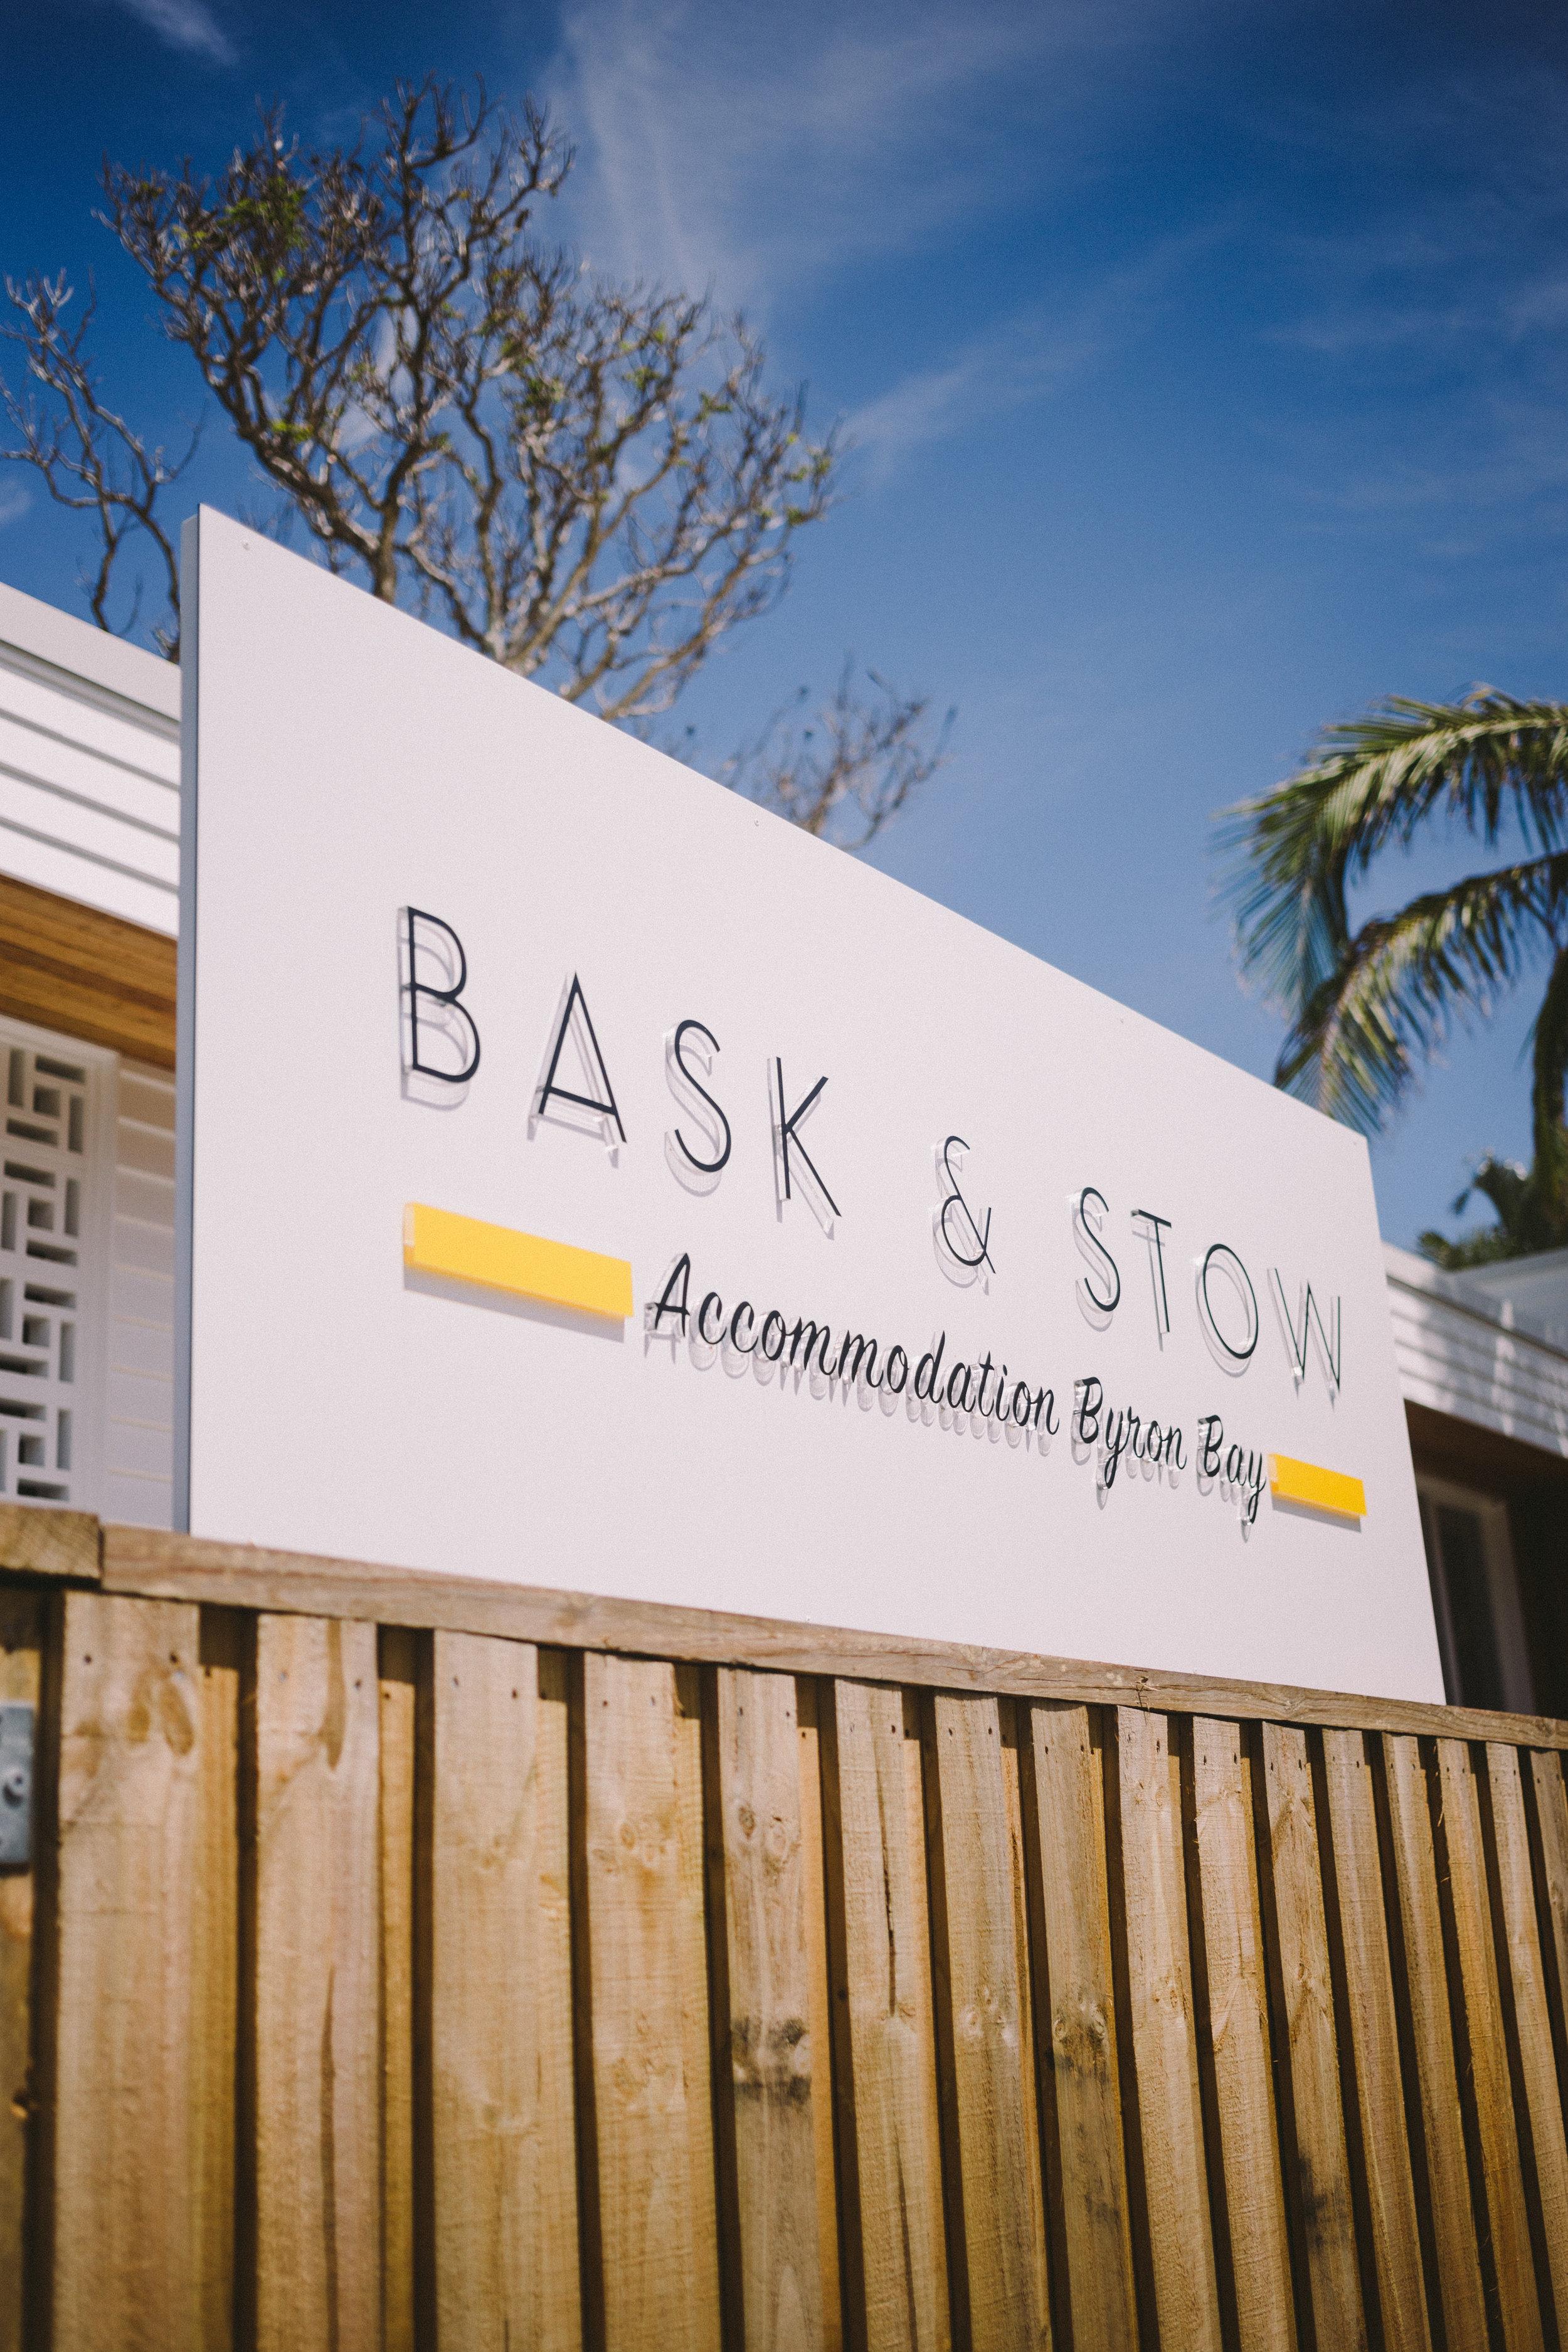 Bask&Stow-001.jpg